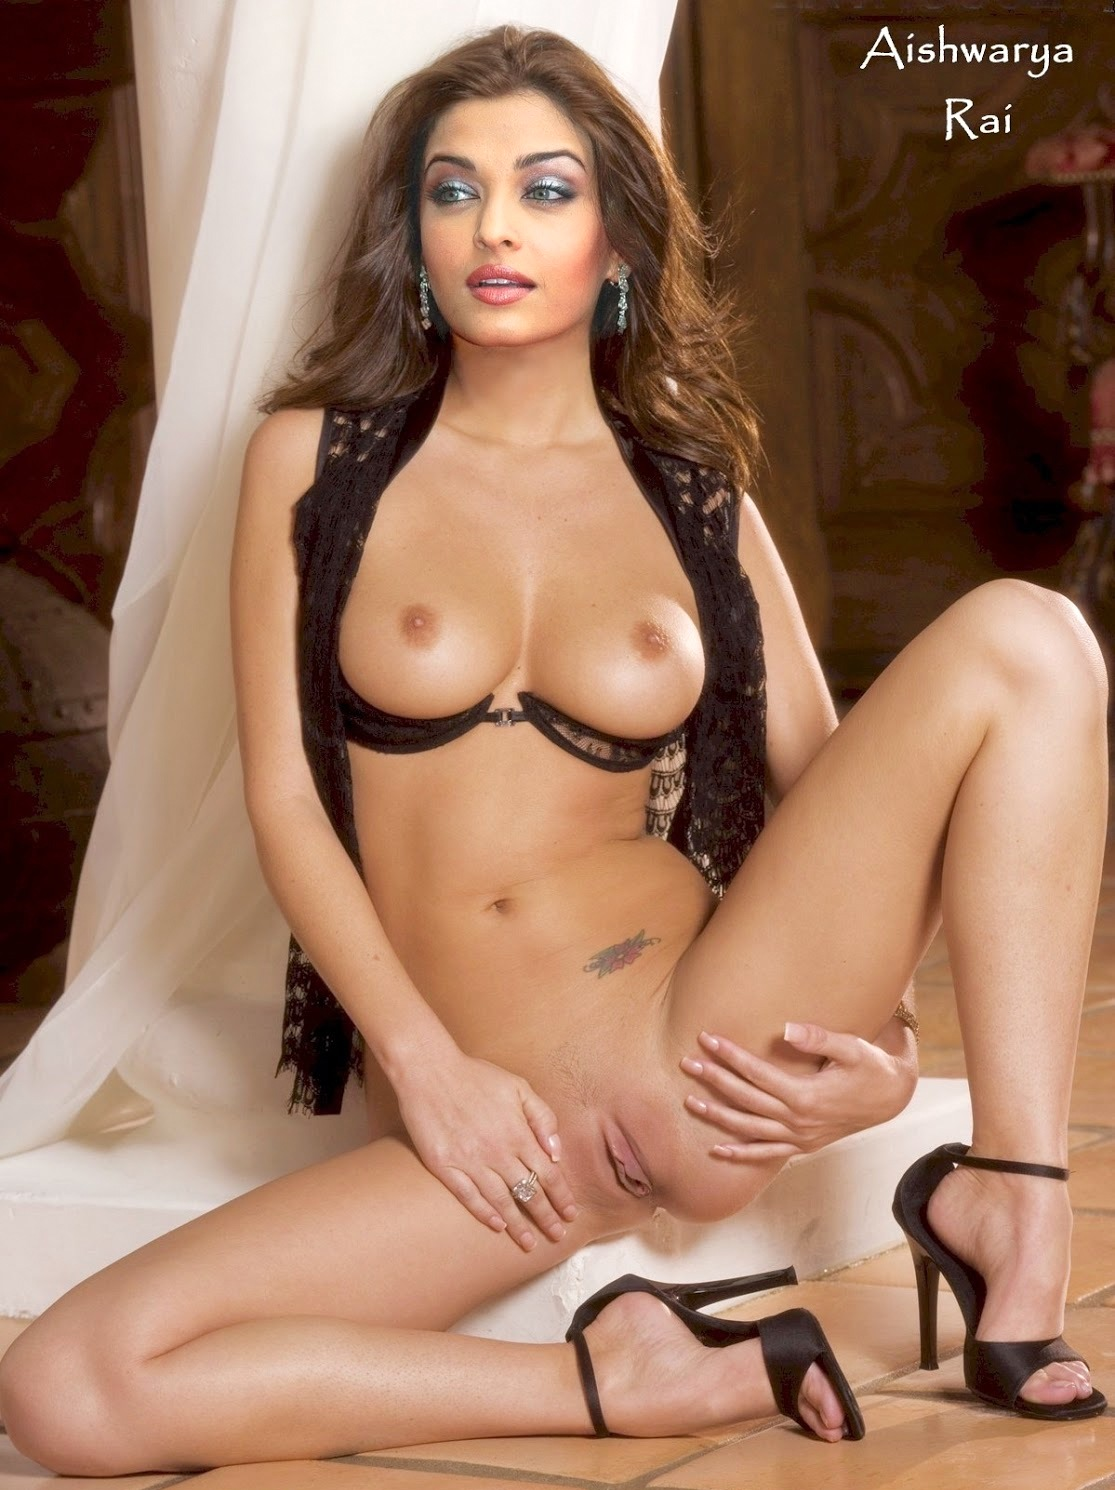 Aishwarya Rai Naked Xxx Pussy And Ass Fucking Sex Pictures Nude Desi Actress